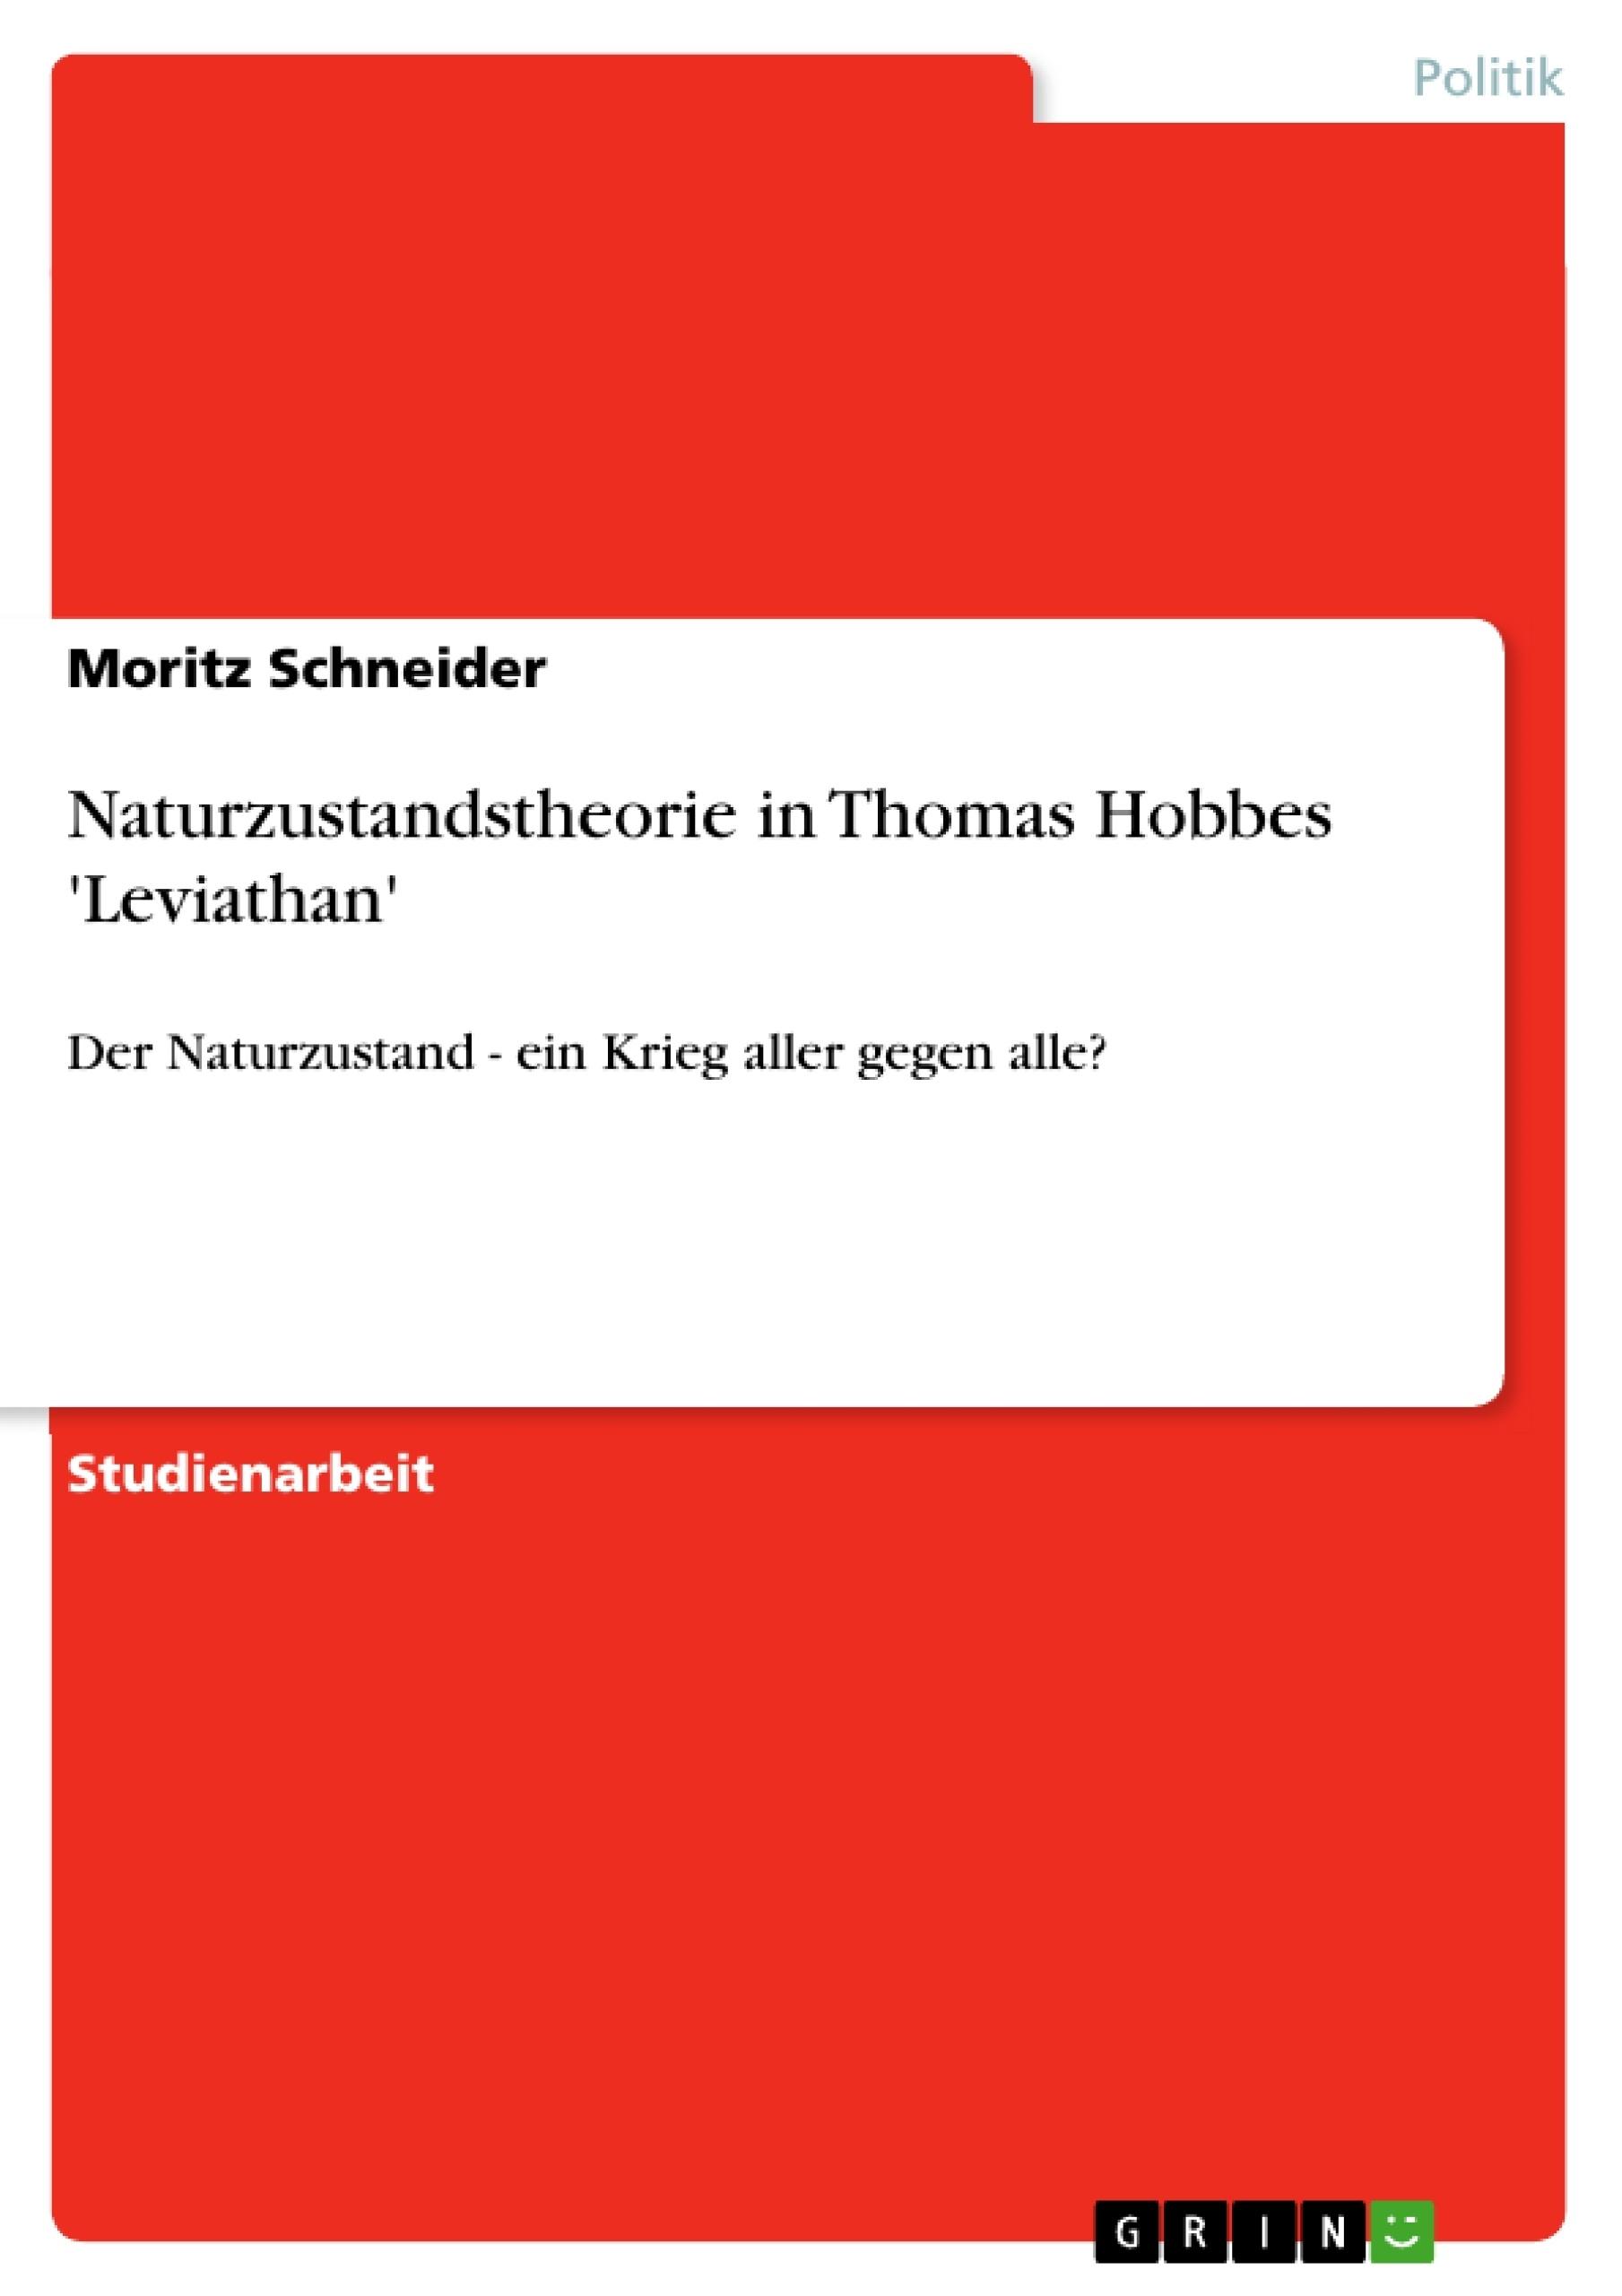 Titel: Naturzustandstheorie in Thomas Hobbes 'Leviathan'